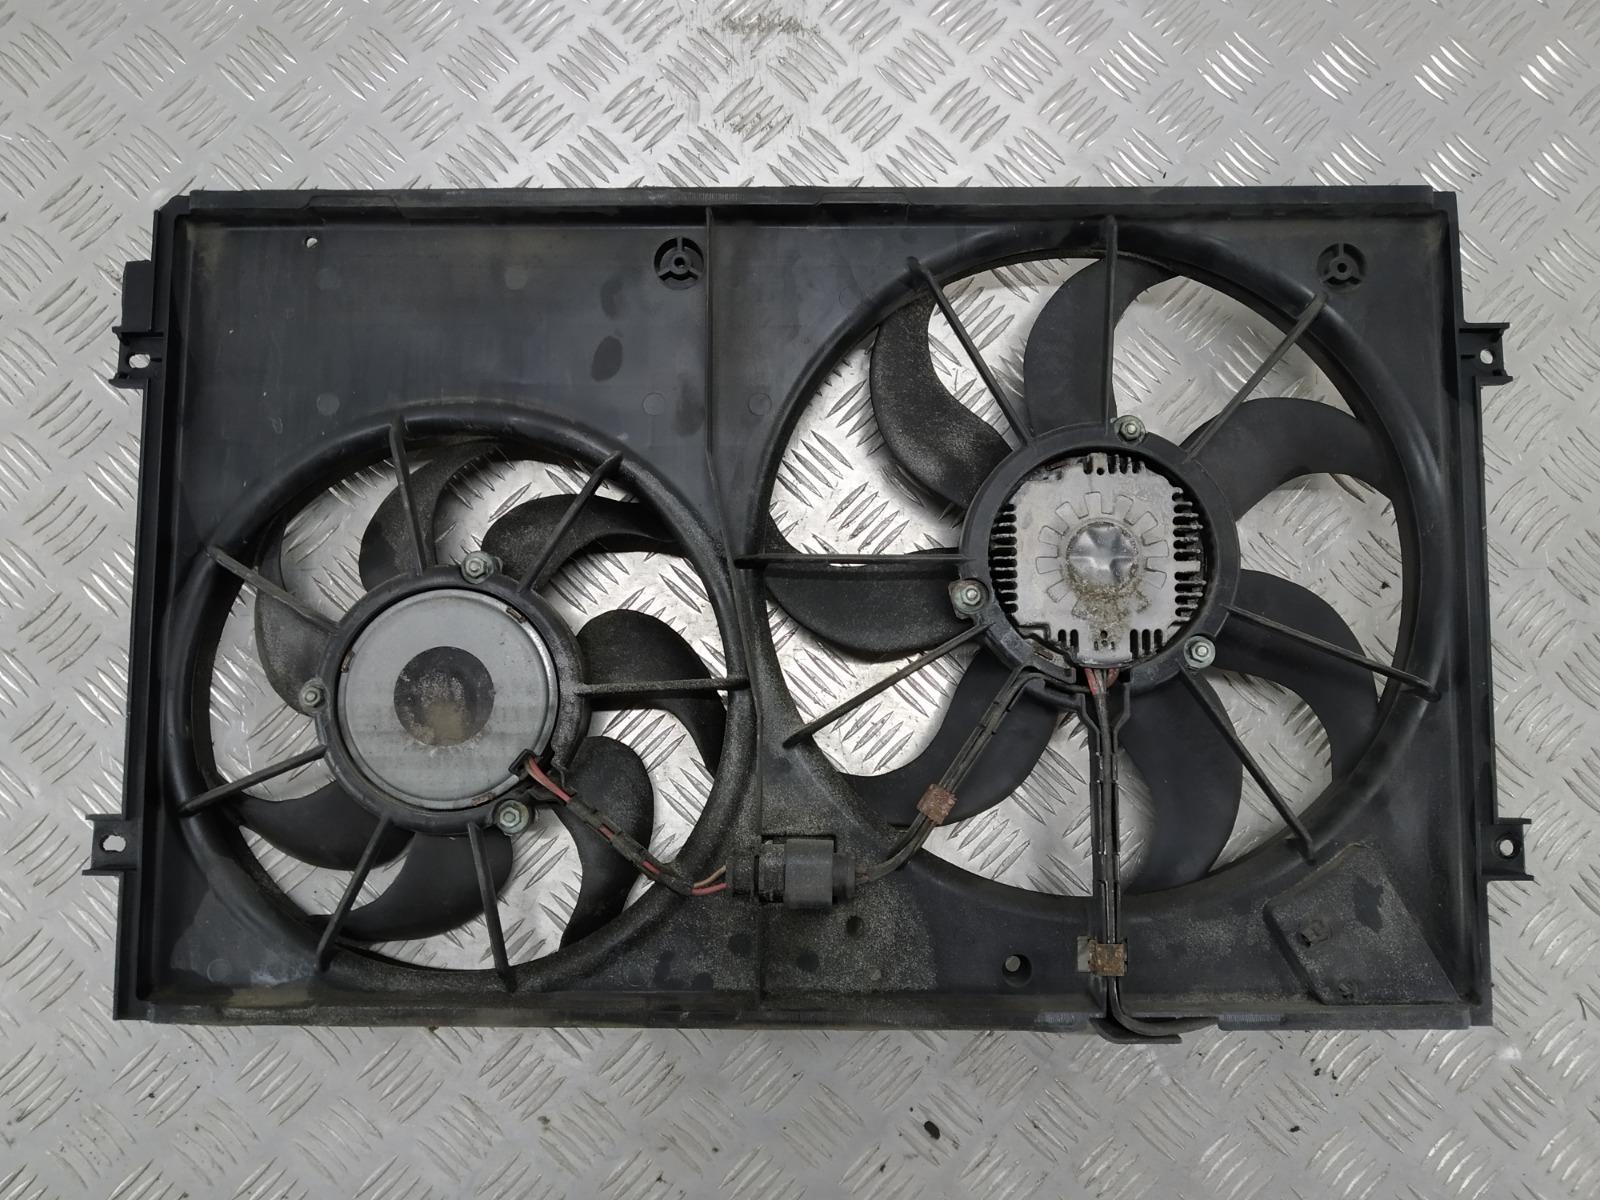 Вентилятор радиатора Volkswagen Golf Plus 1.9 TDI 2005 (б/у)